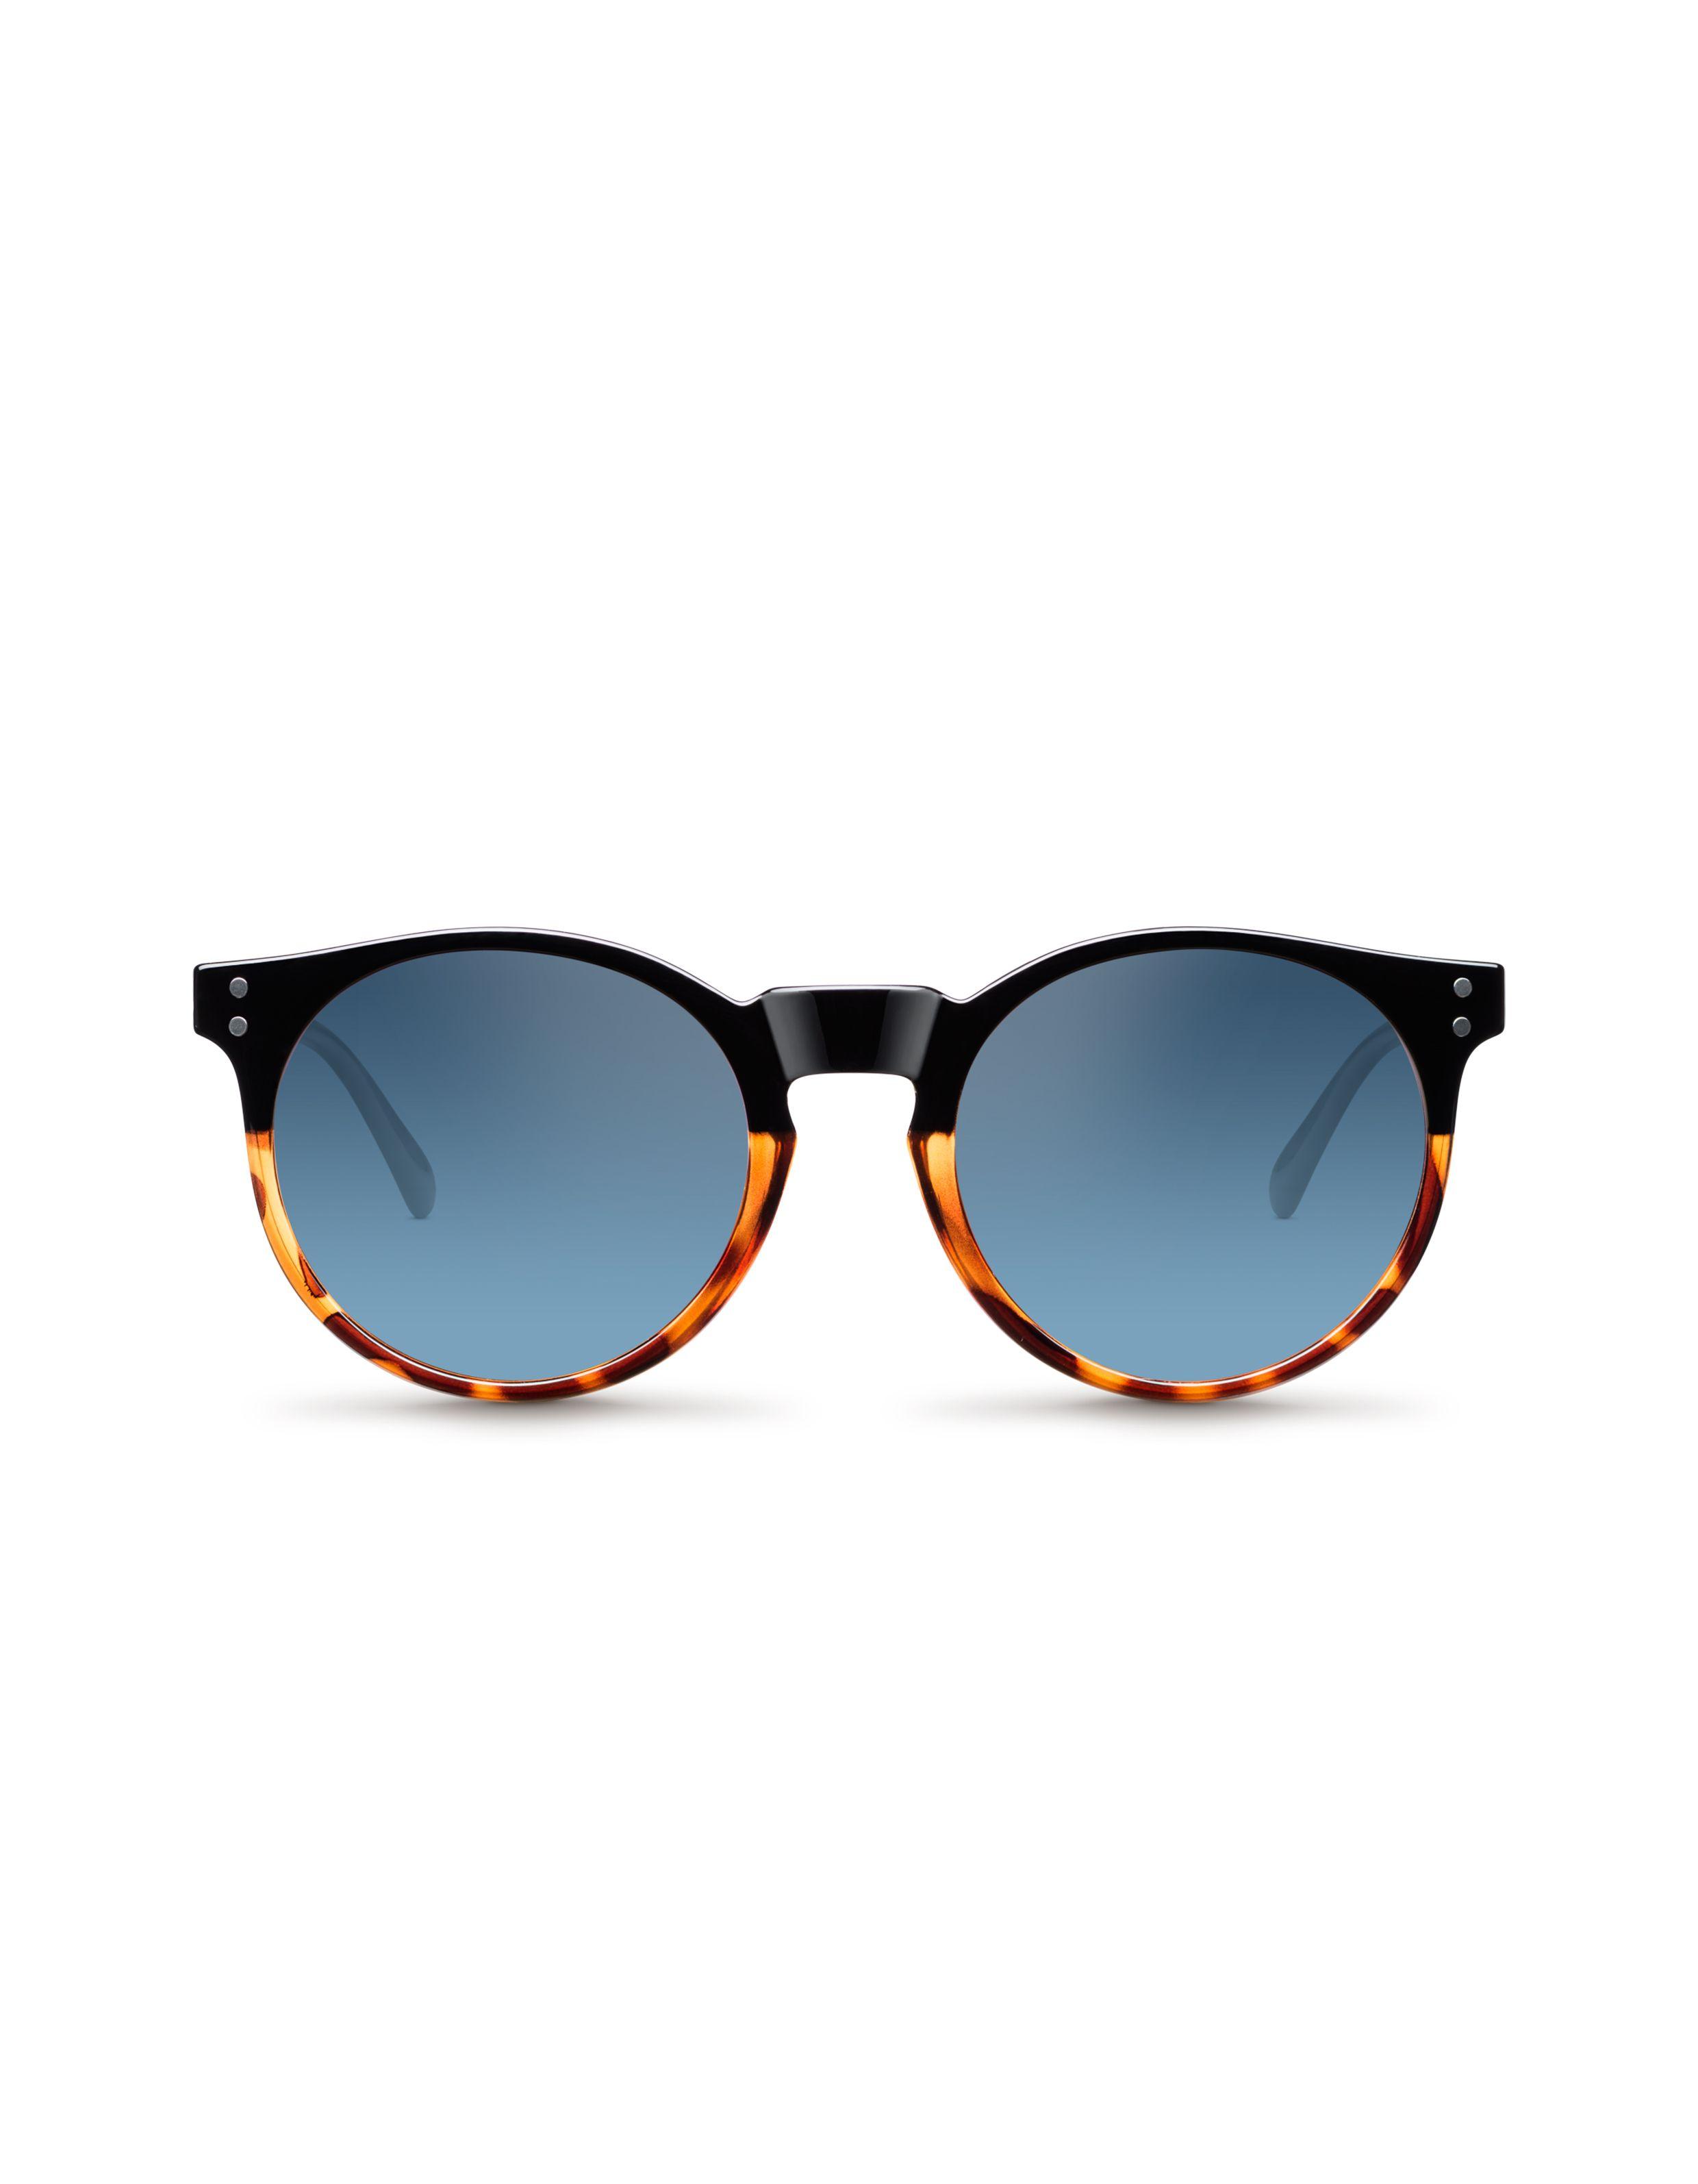 38634b632b Meller Sunglasses | Kubu Tuttig Sea | Kubu | Sunglasses, Fashion y ...